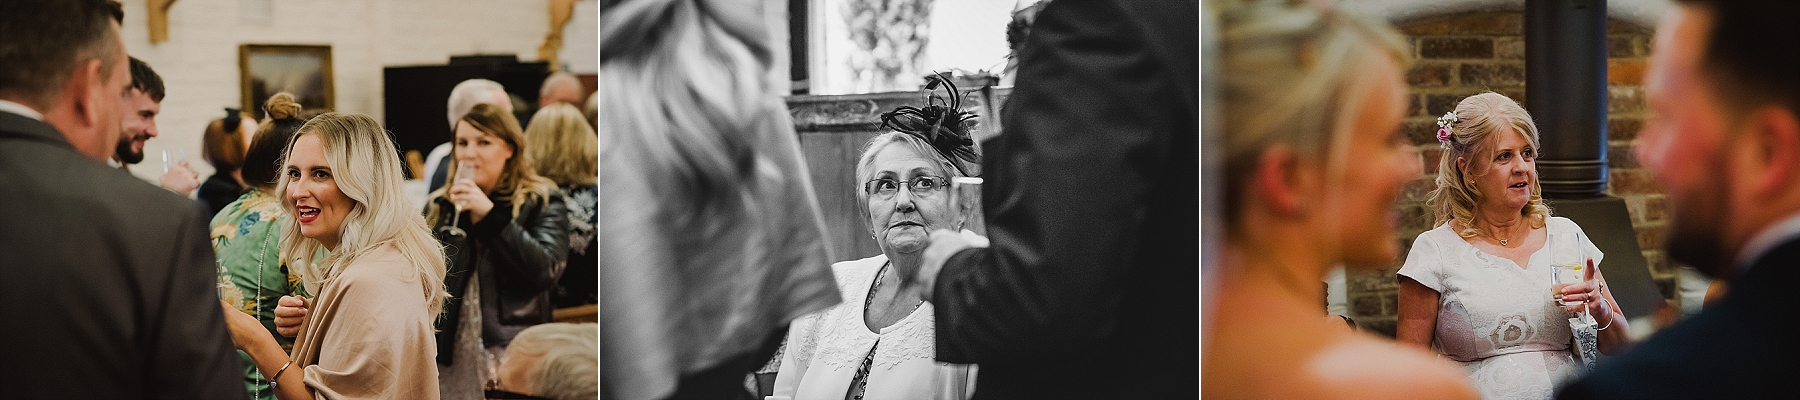 chris_keely_downton_lodge_wedding_0057.jpg